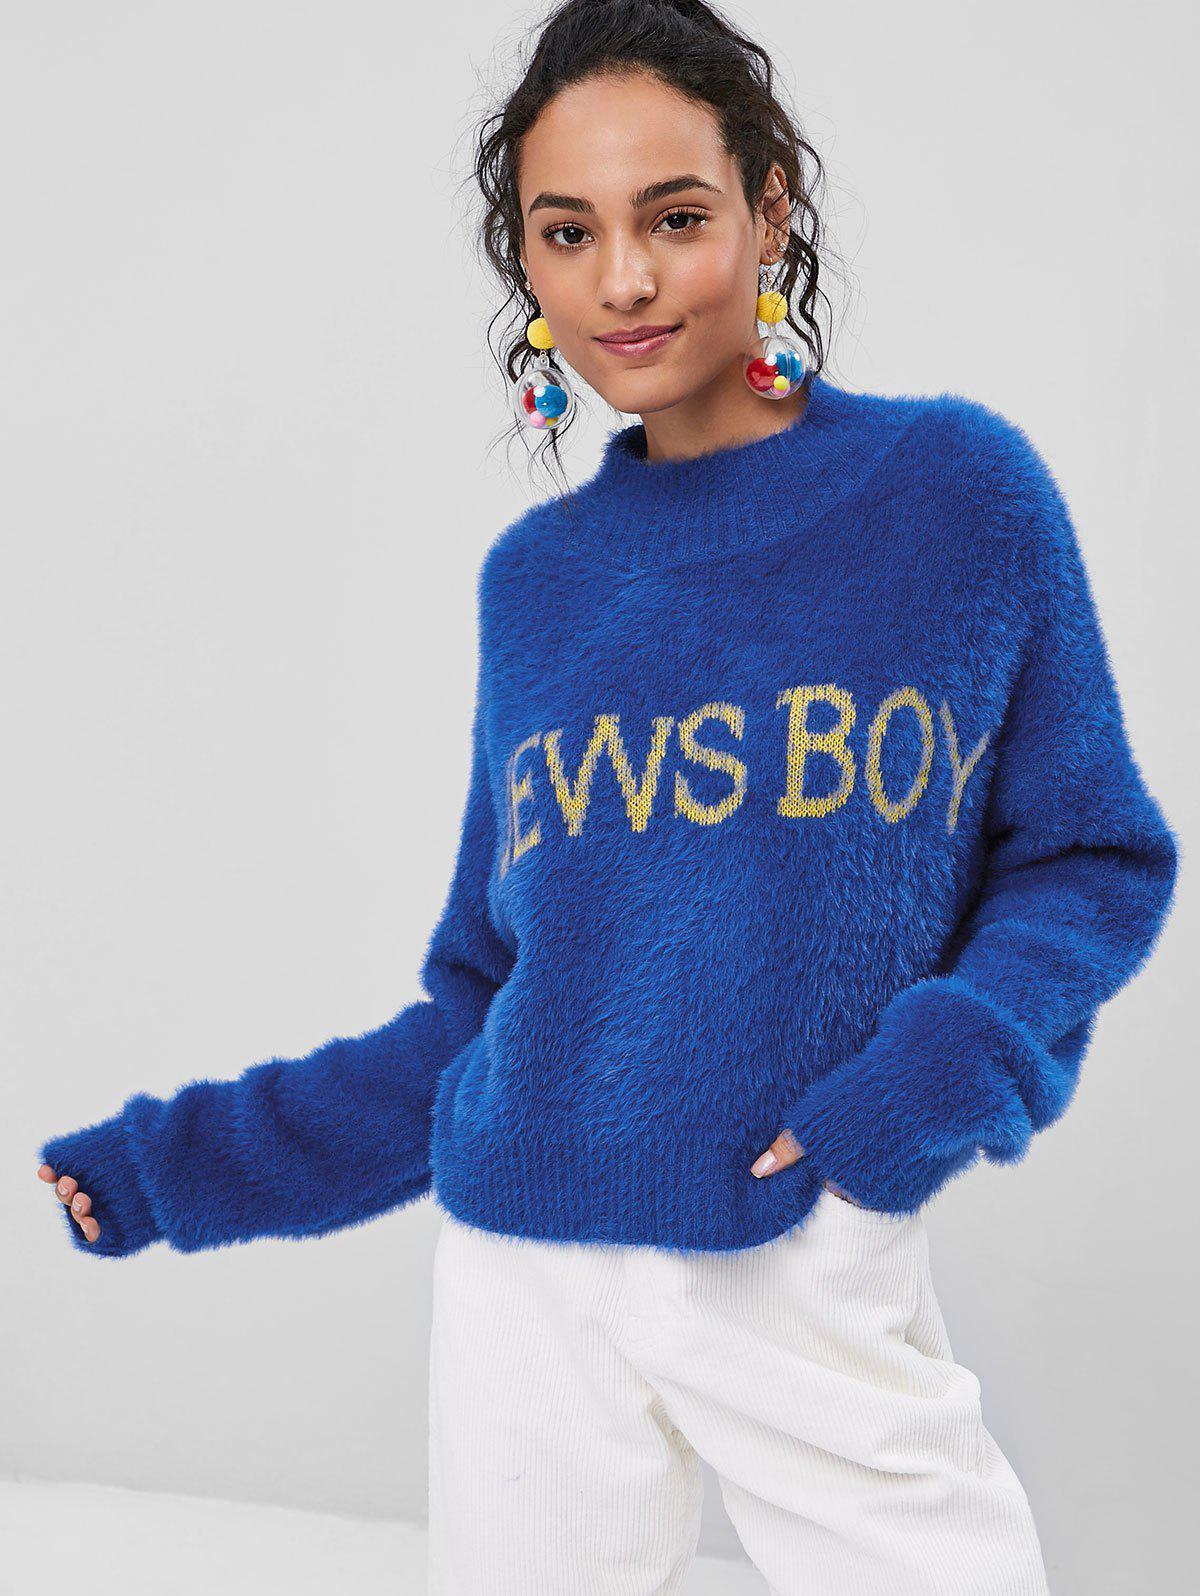 High Neck News Boy Fuzzy Sweater